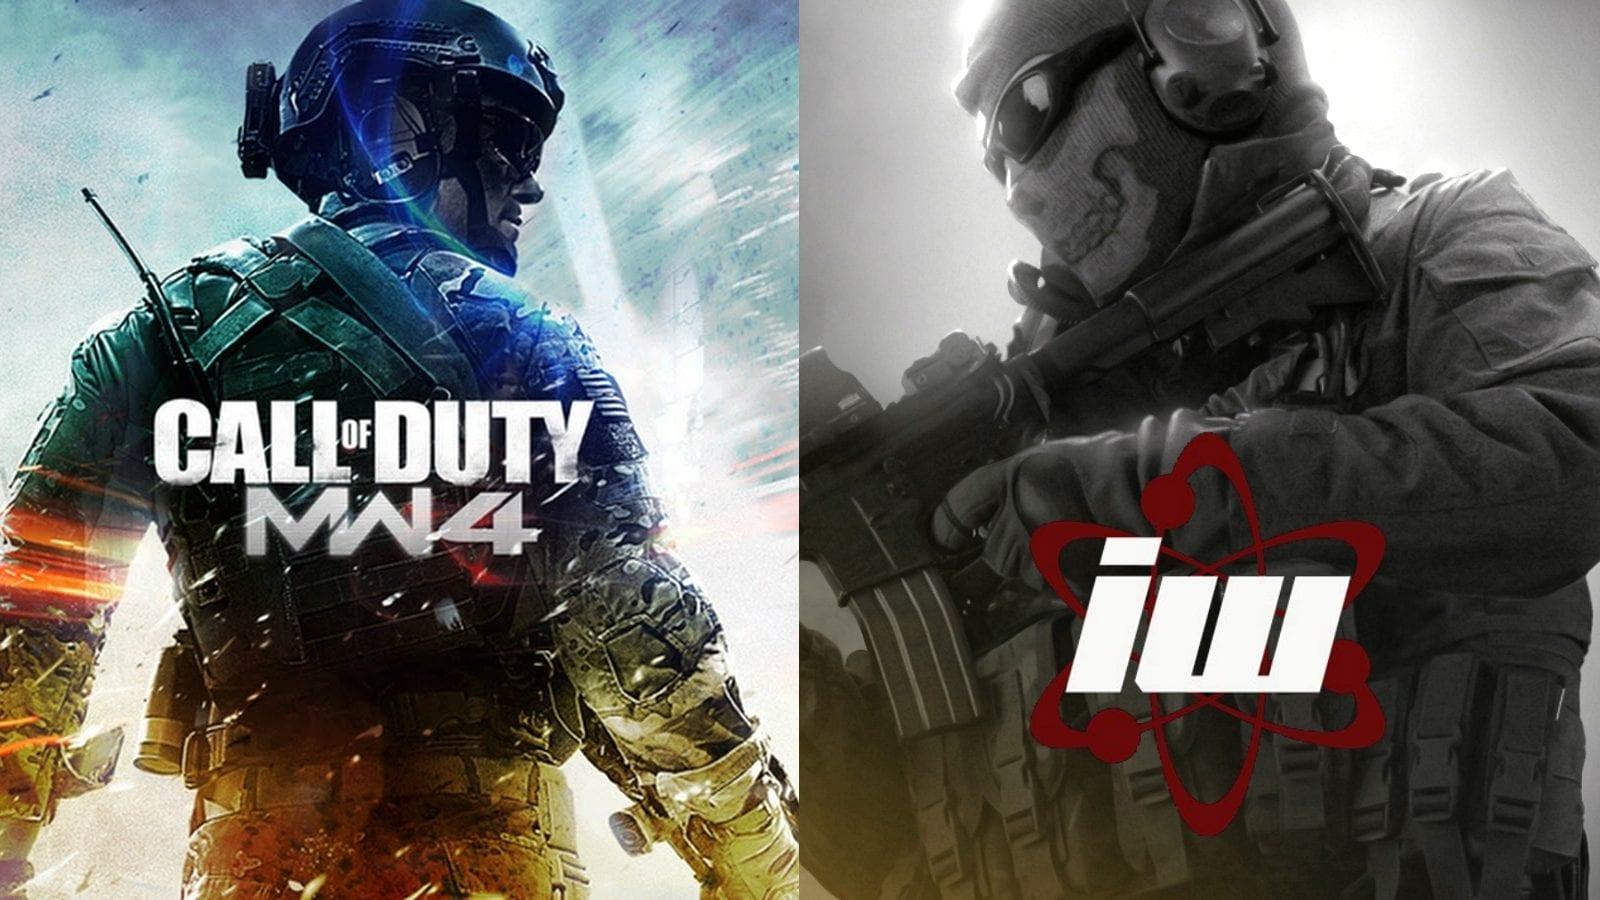 Call of Duty Modern Warfare 4 update